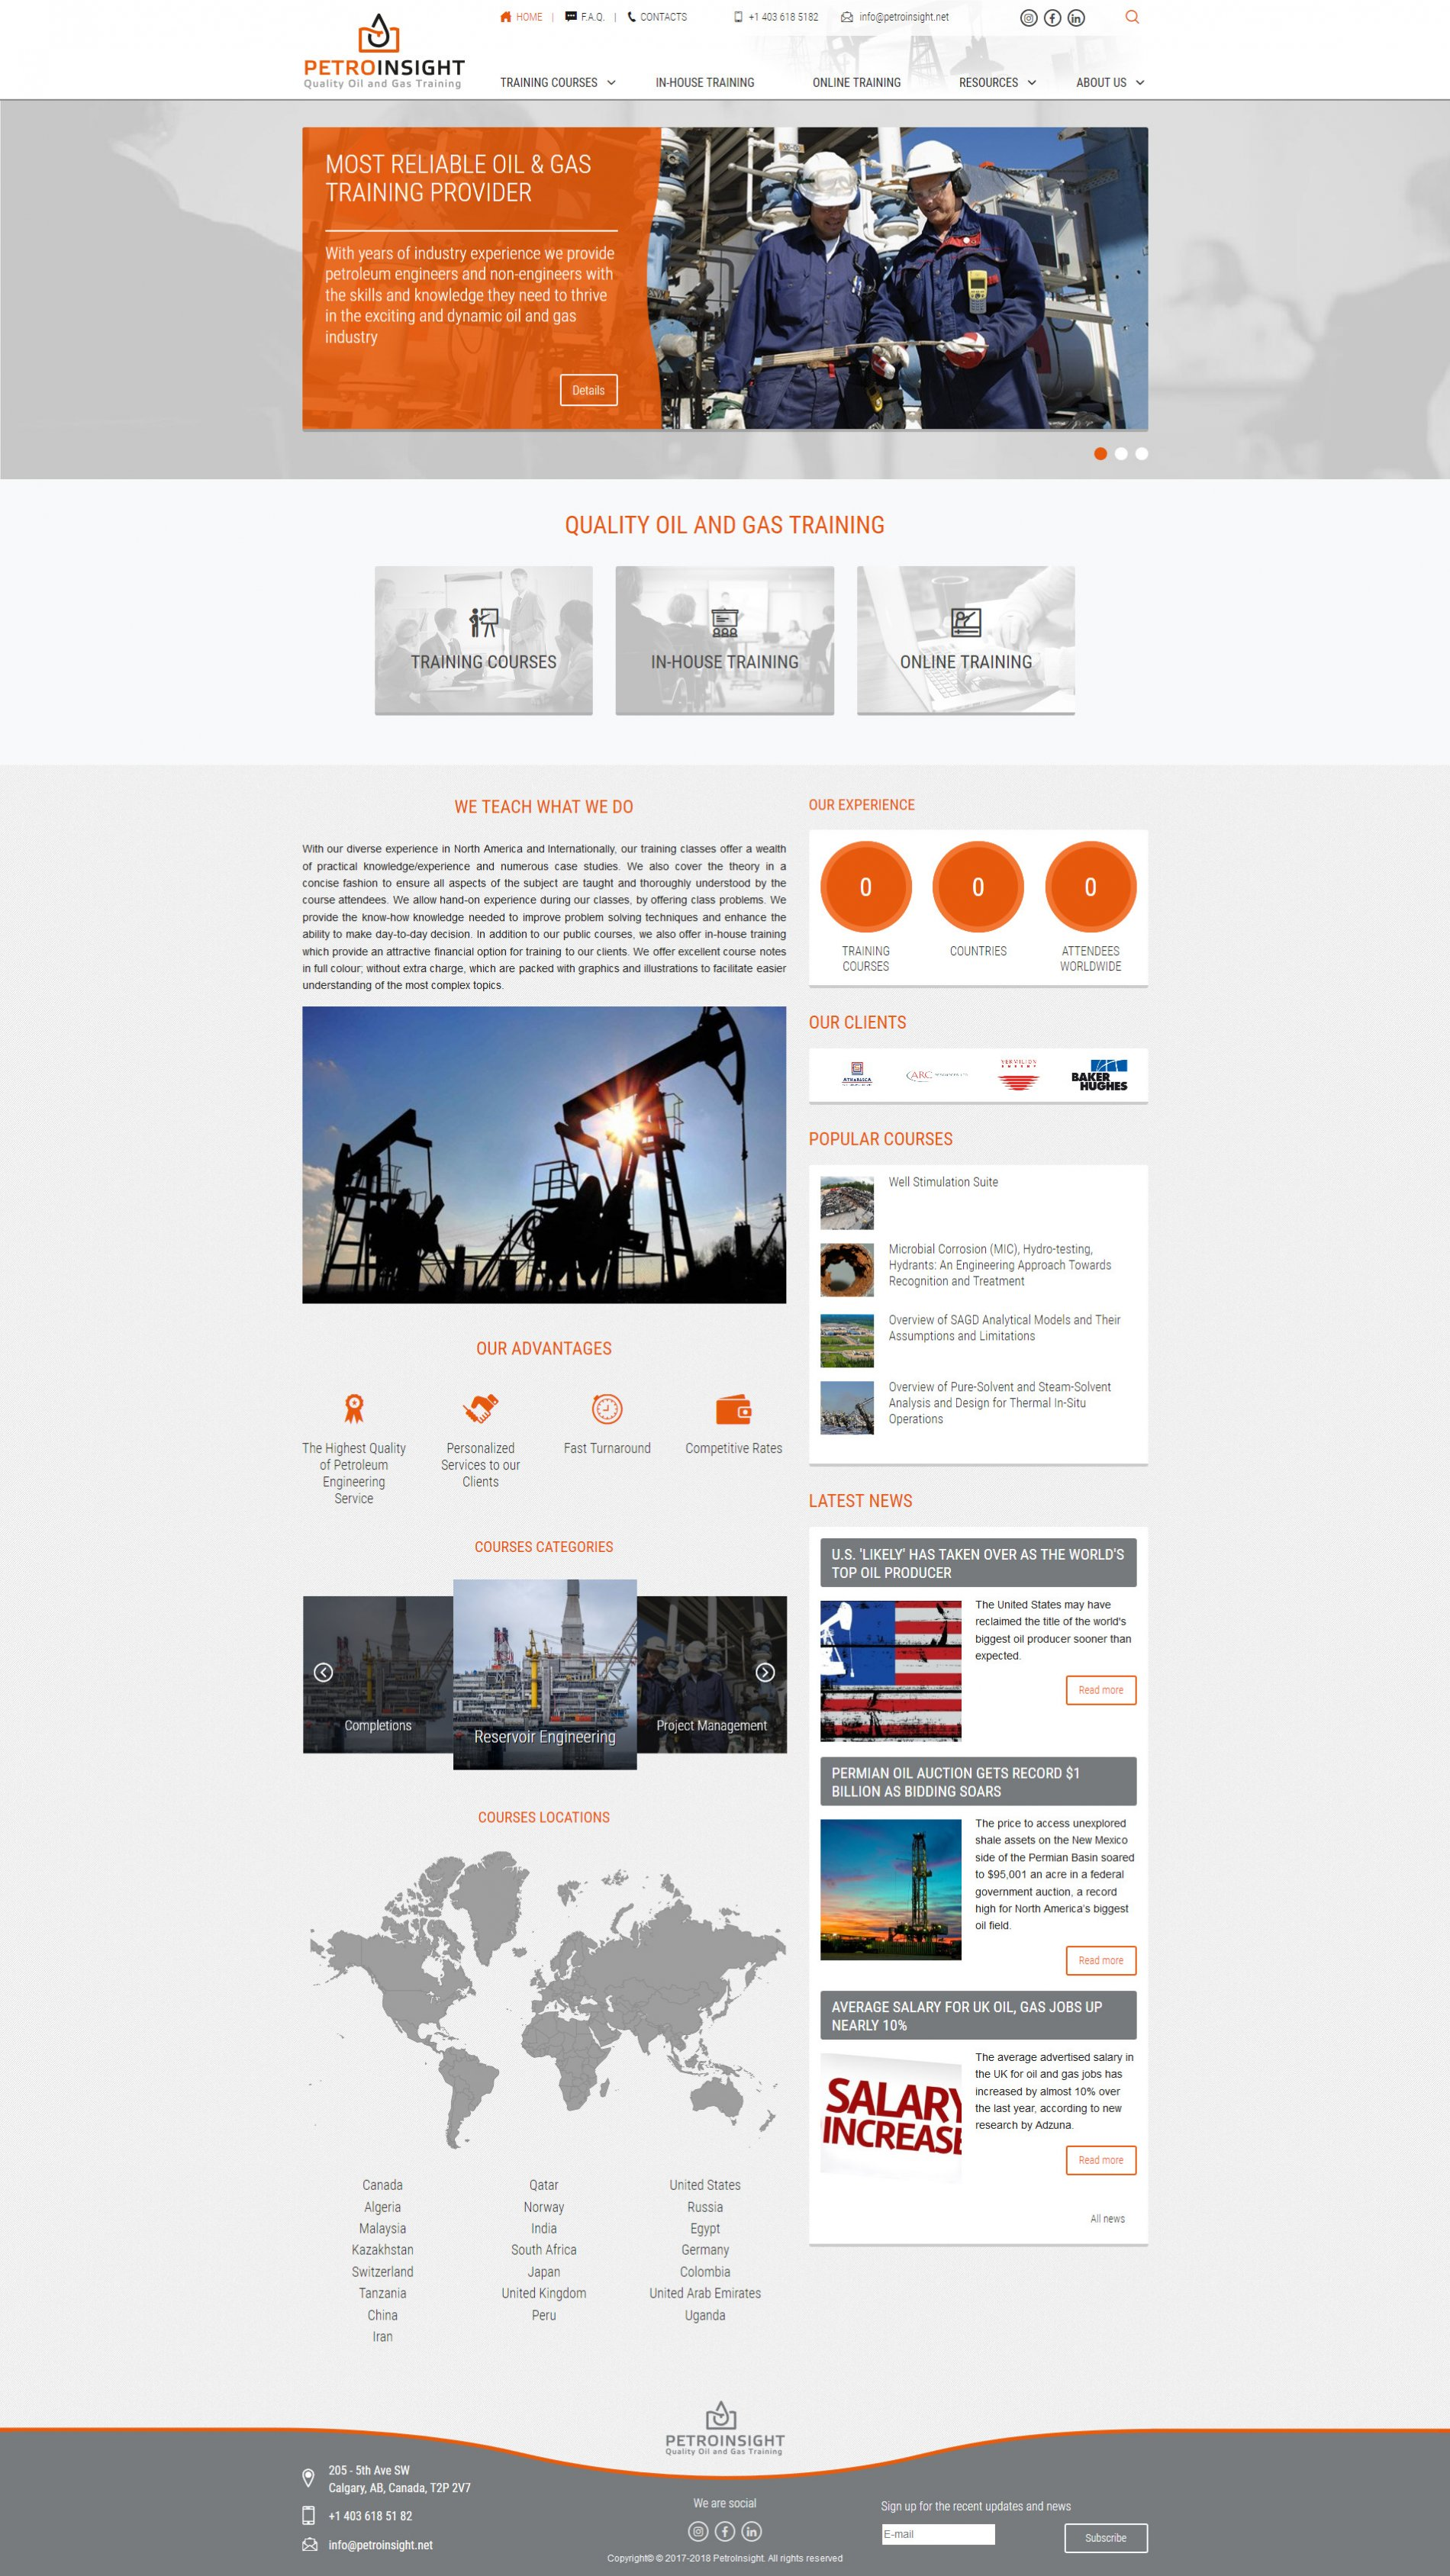 Головна сторінка Petroinsight